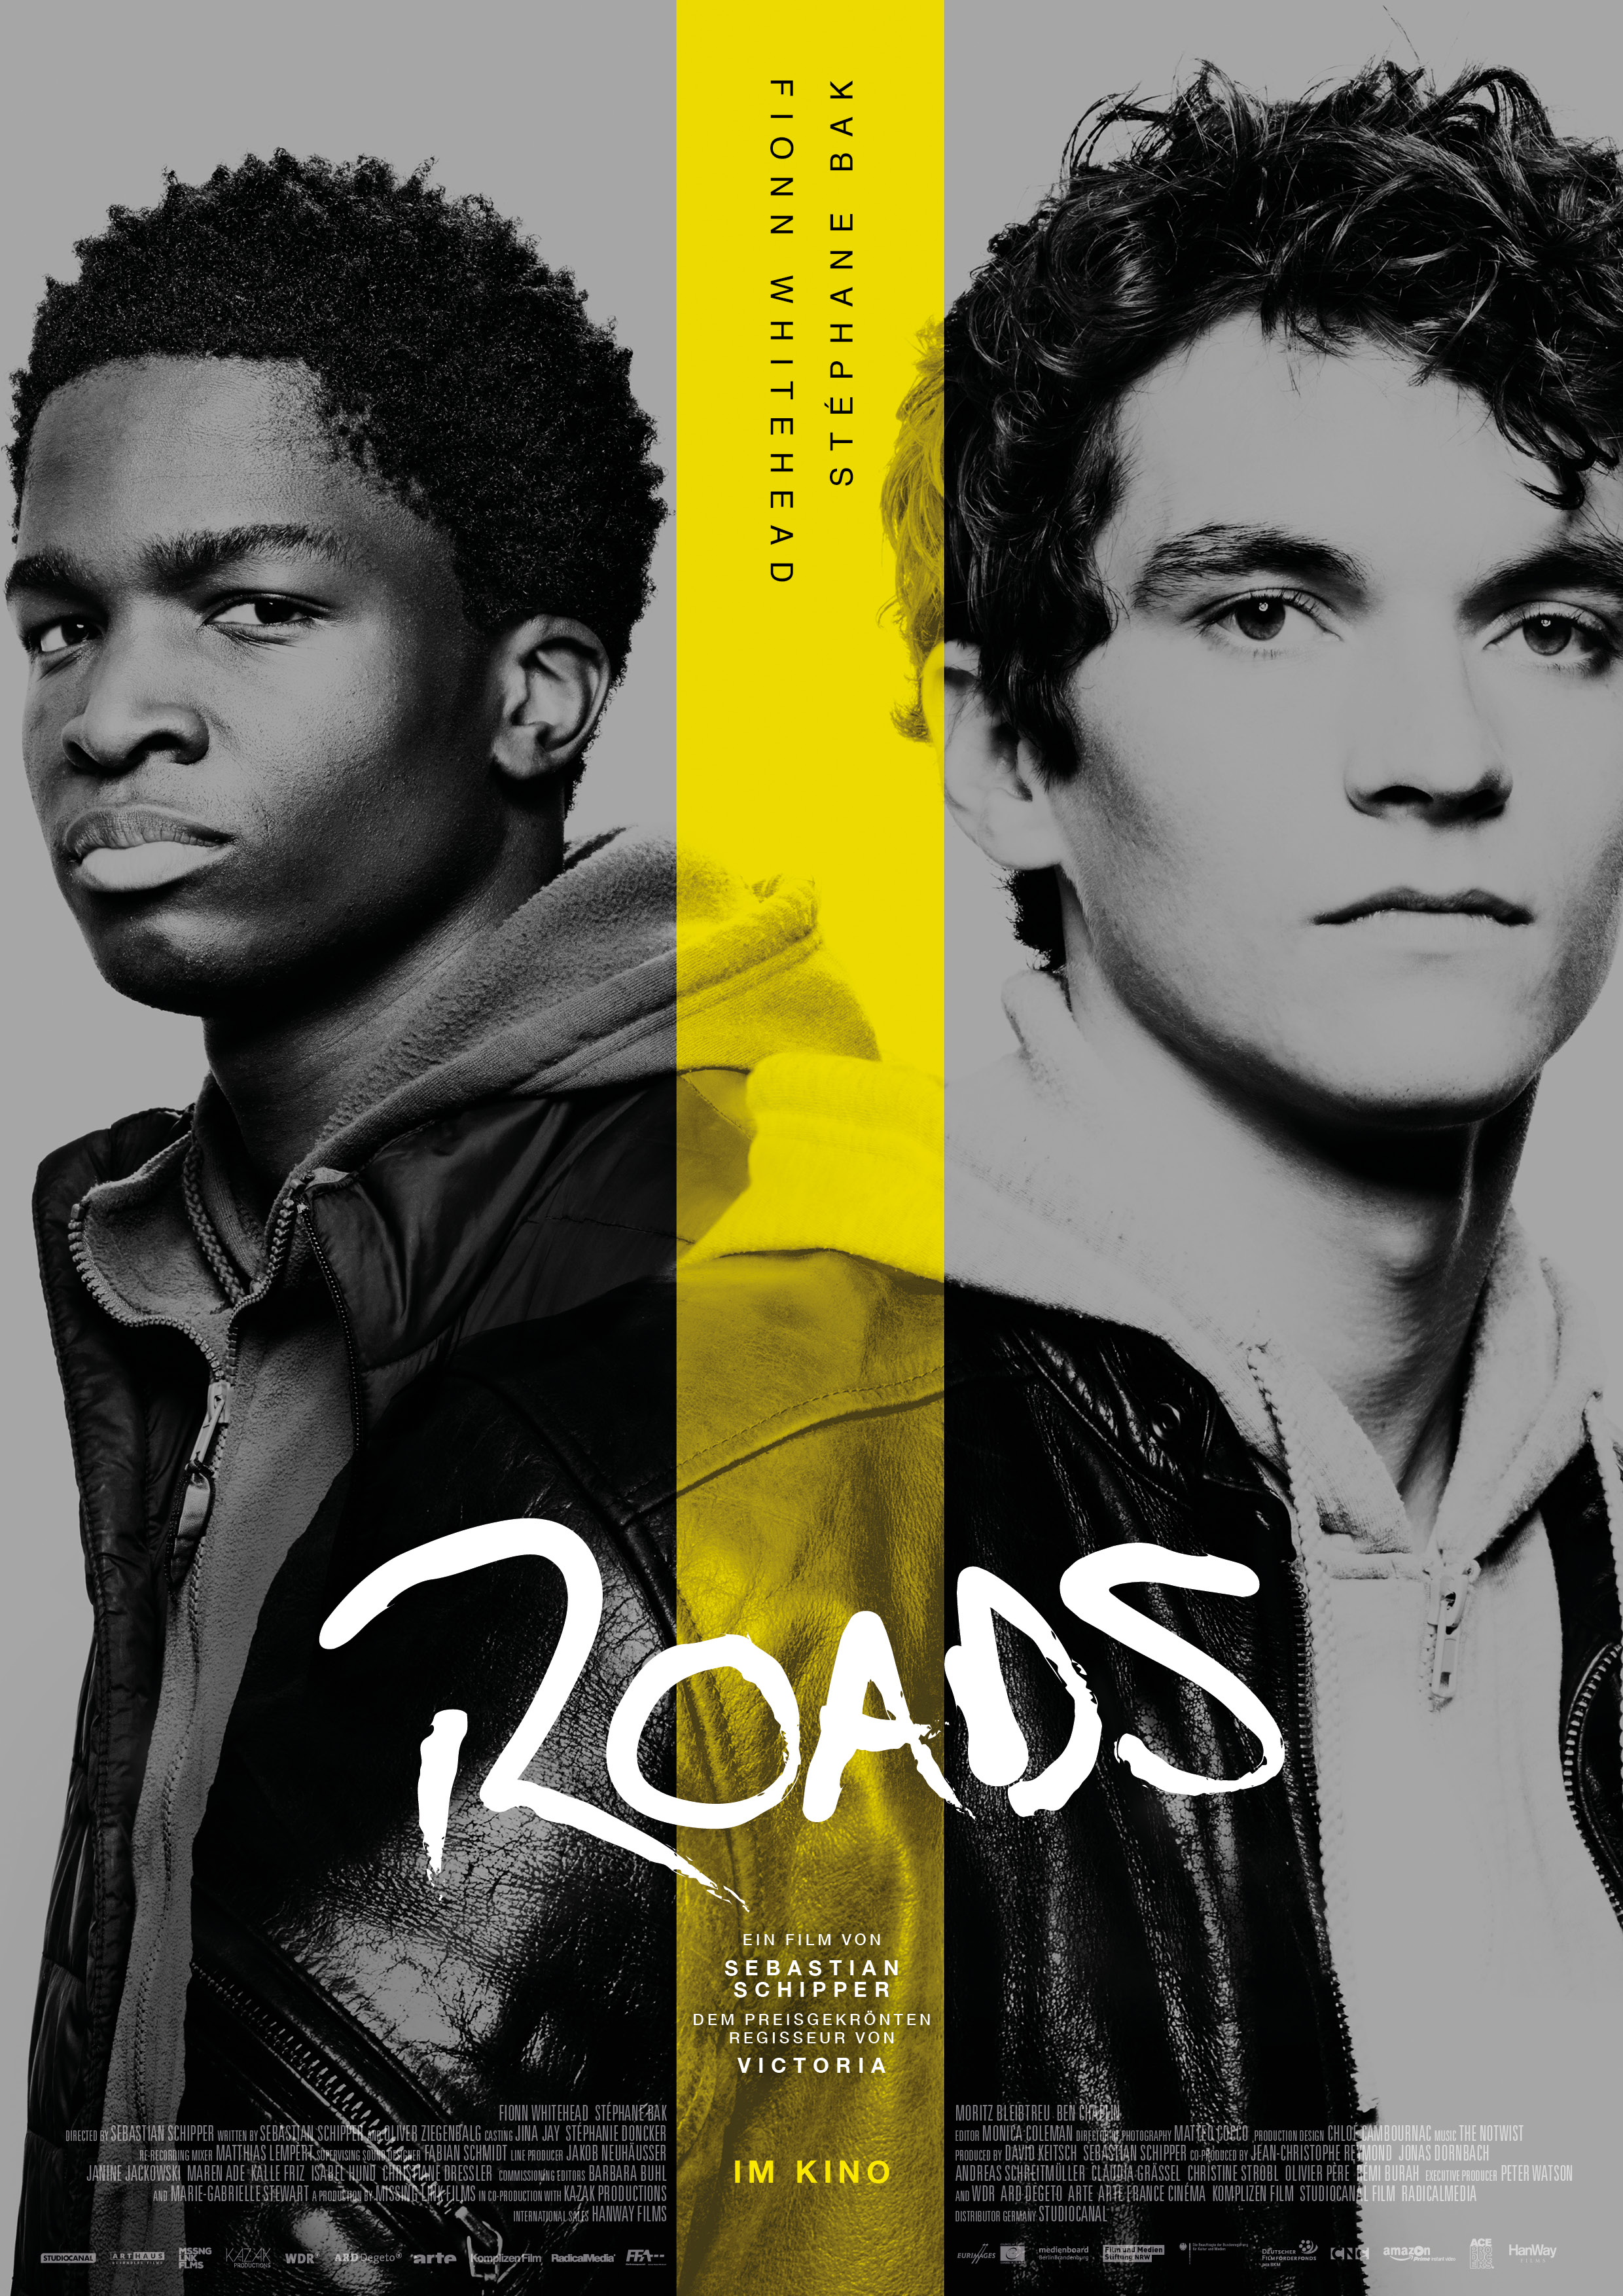 21b5a94e8ea66 Roads Film (2018) · Trailer · Kritik · KINO.de